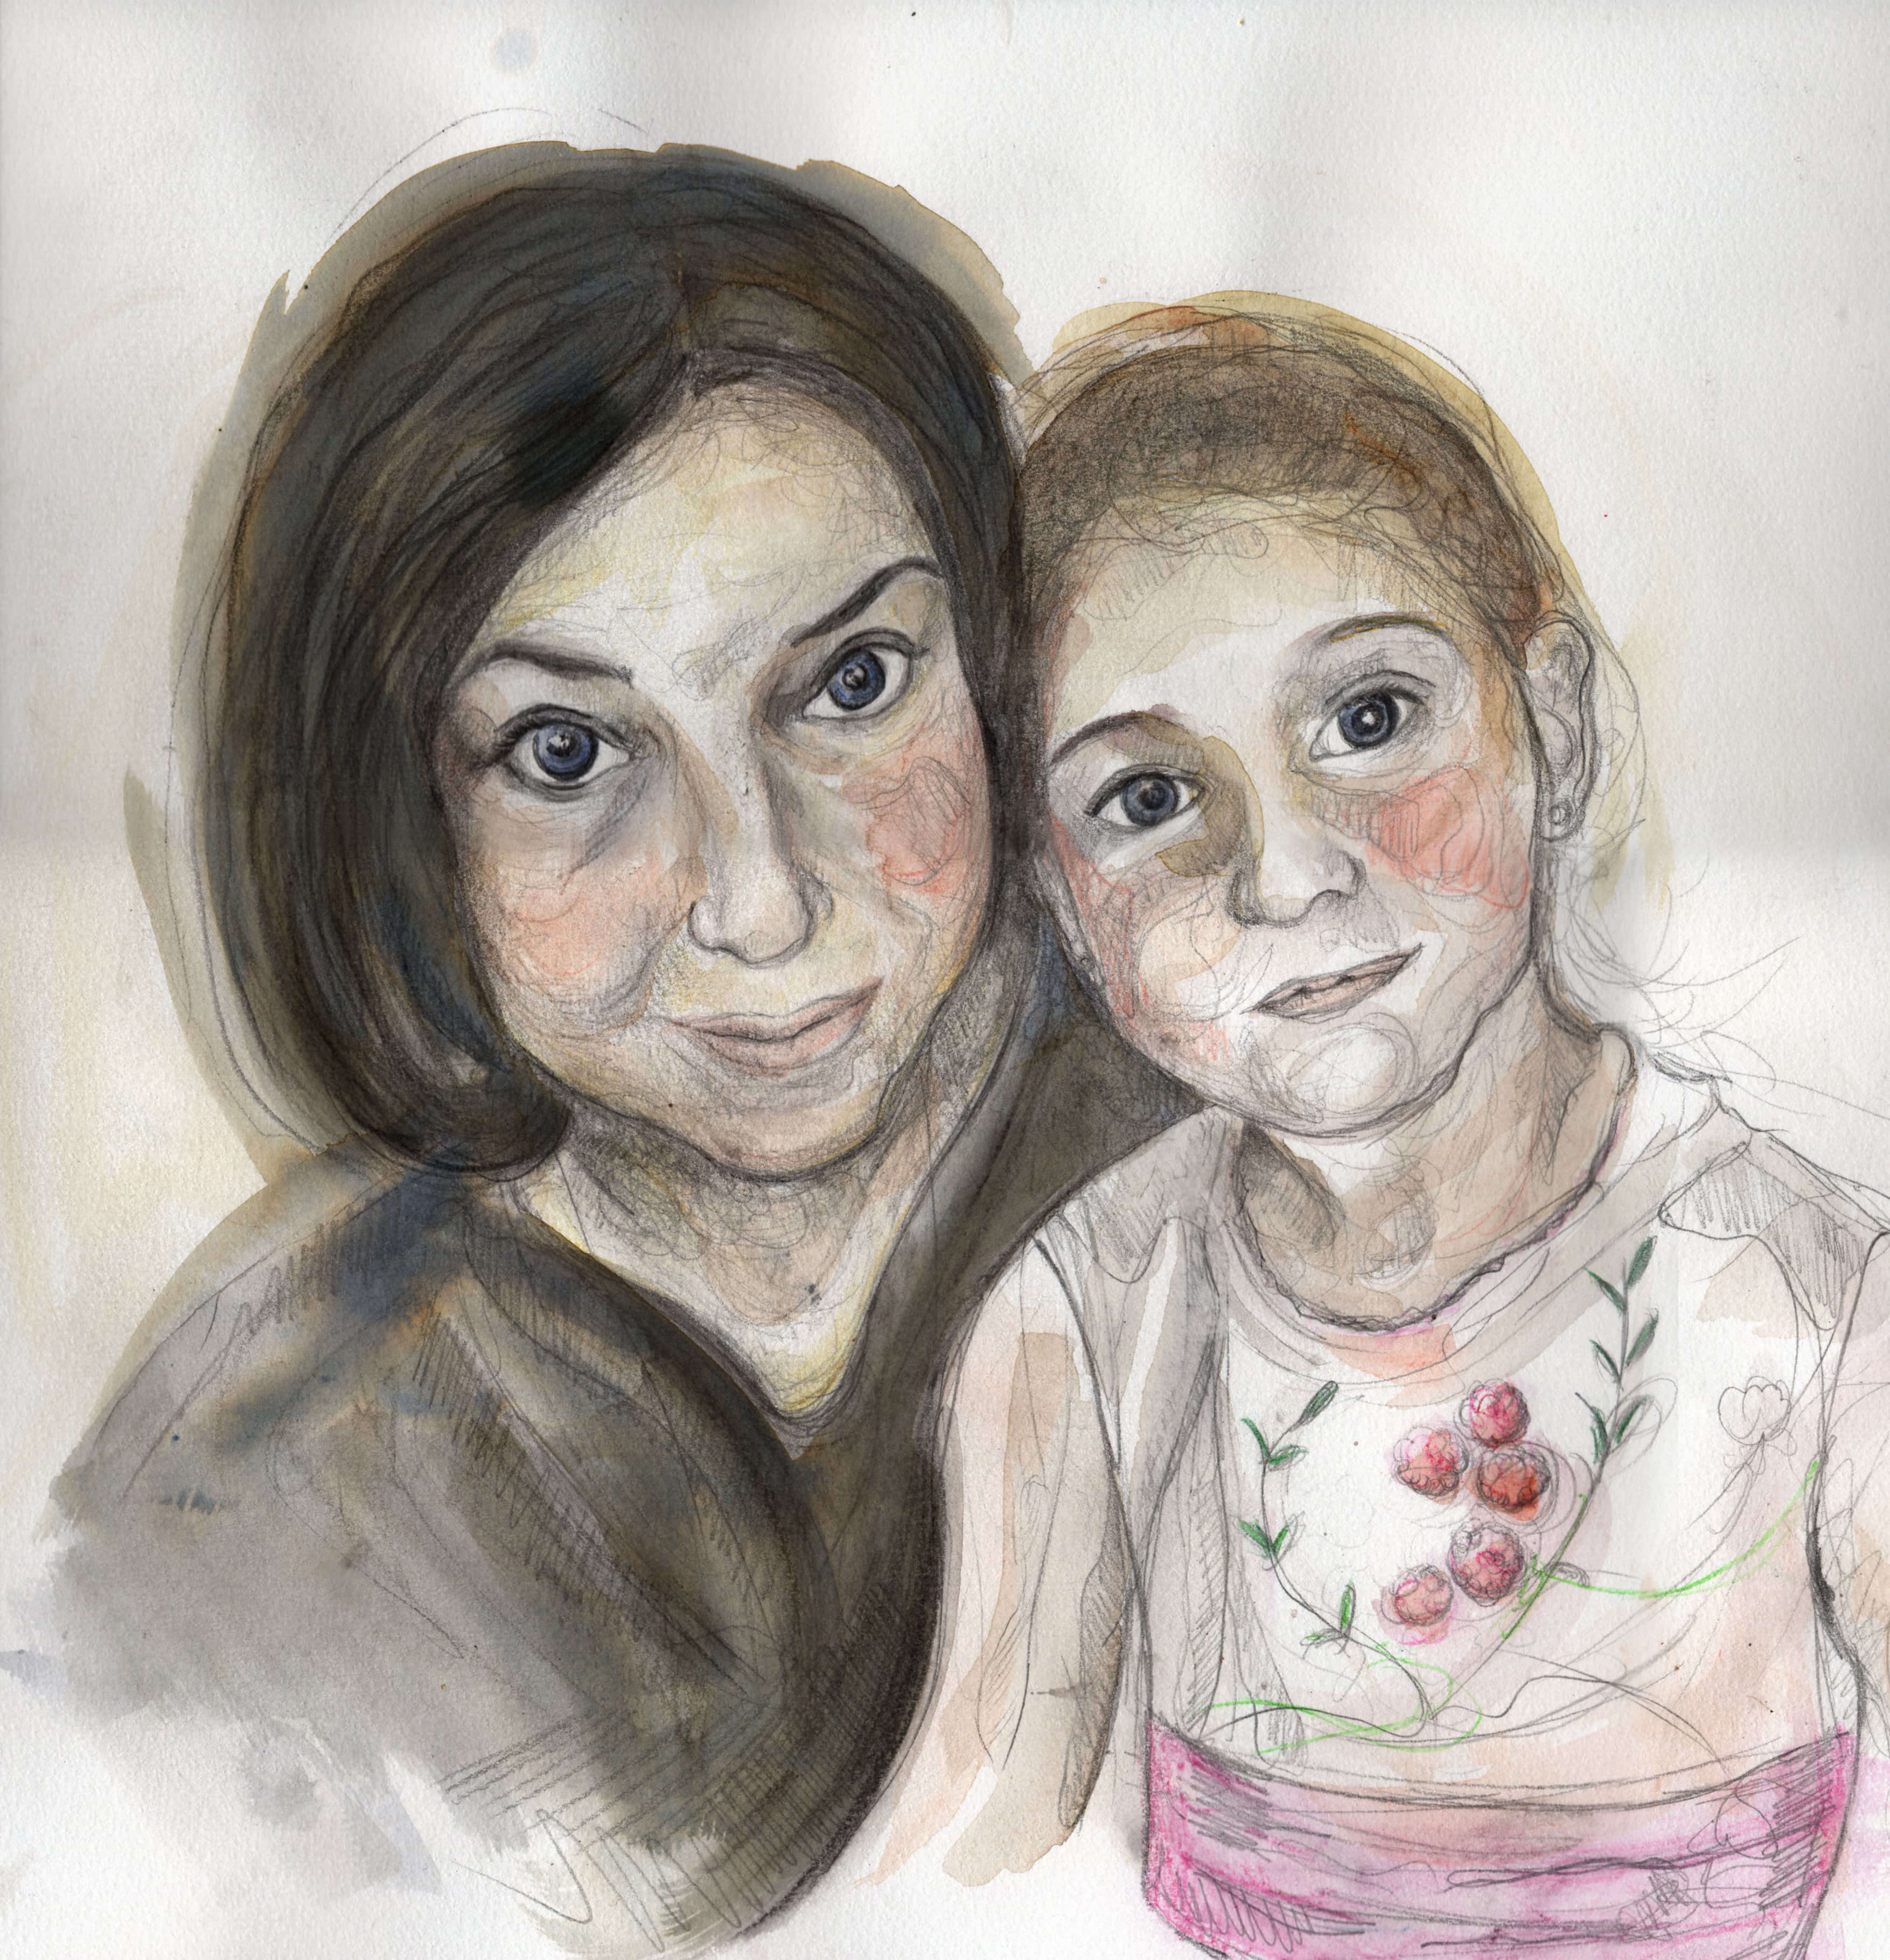 Laura y Noelia_acuarela, lápiz